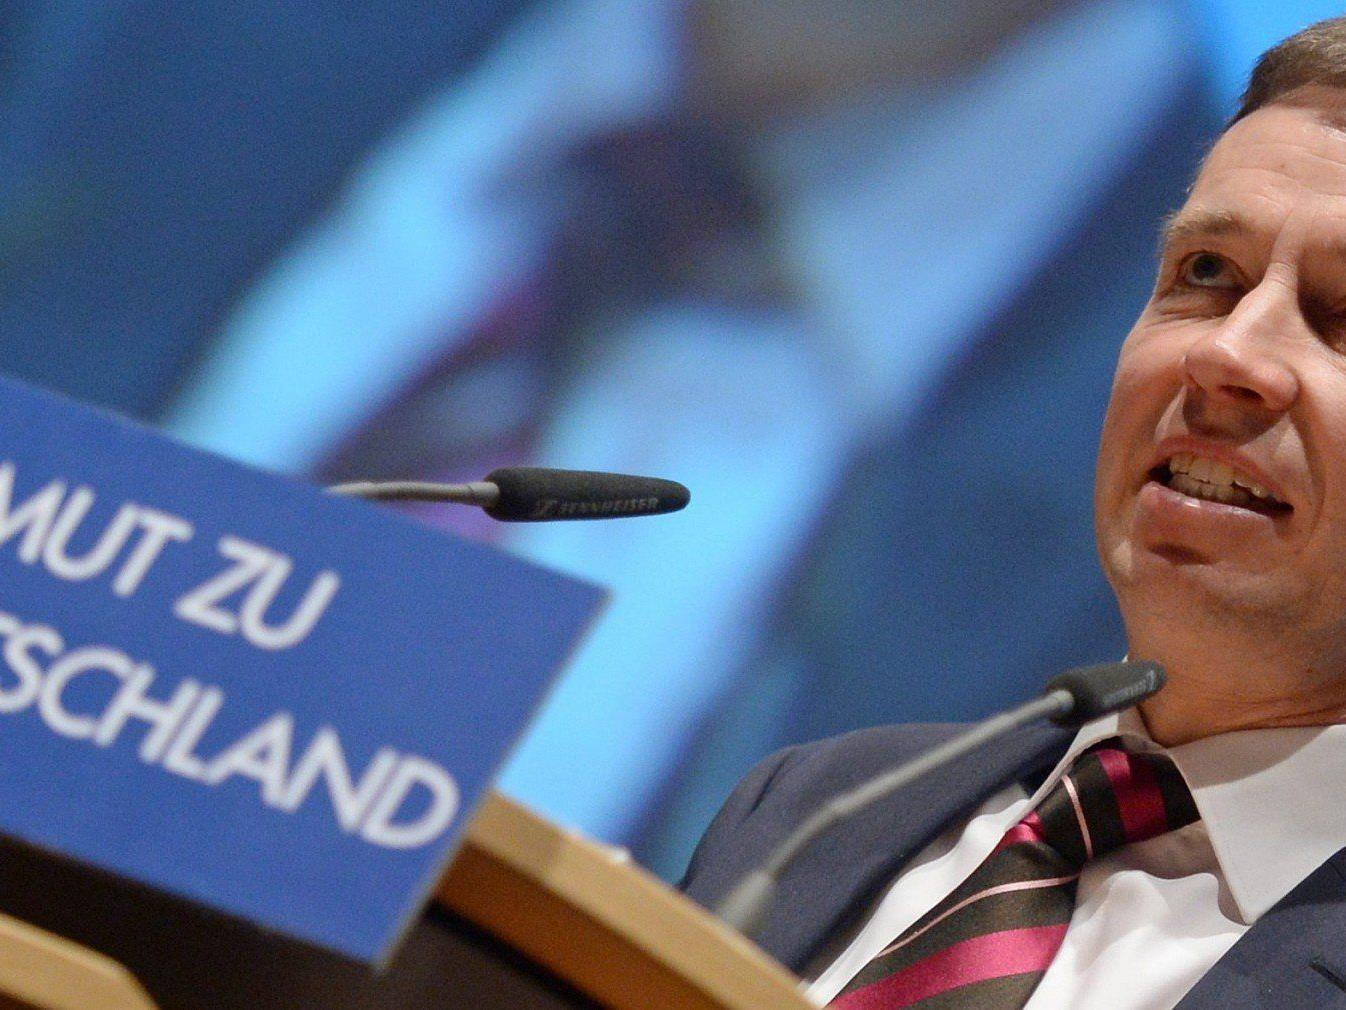 ARD: CDU/CSU bei 36 Prozent, Sozialdemokraten bei 27,5 Prozent - AfD aus dem Stand bei 6,5 Prozent.